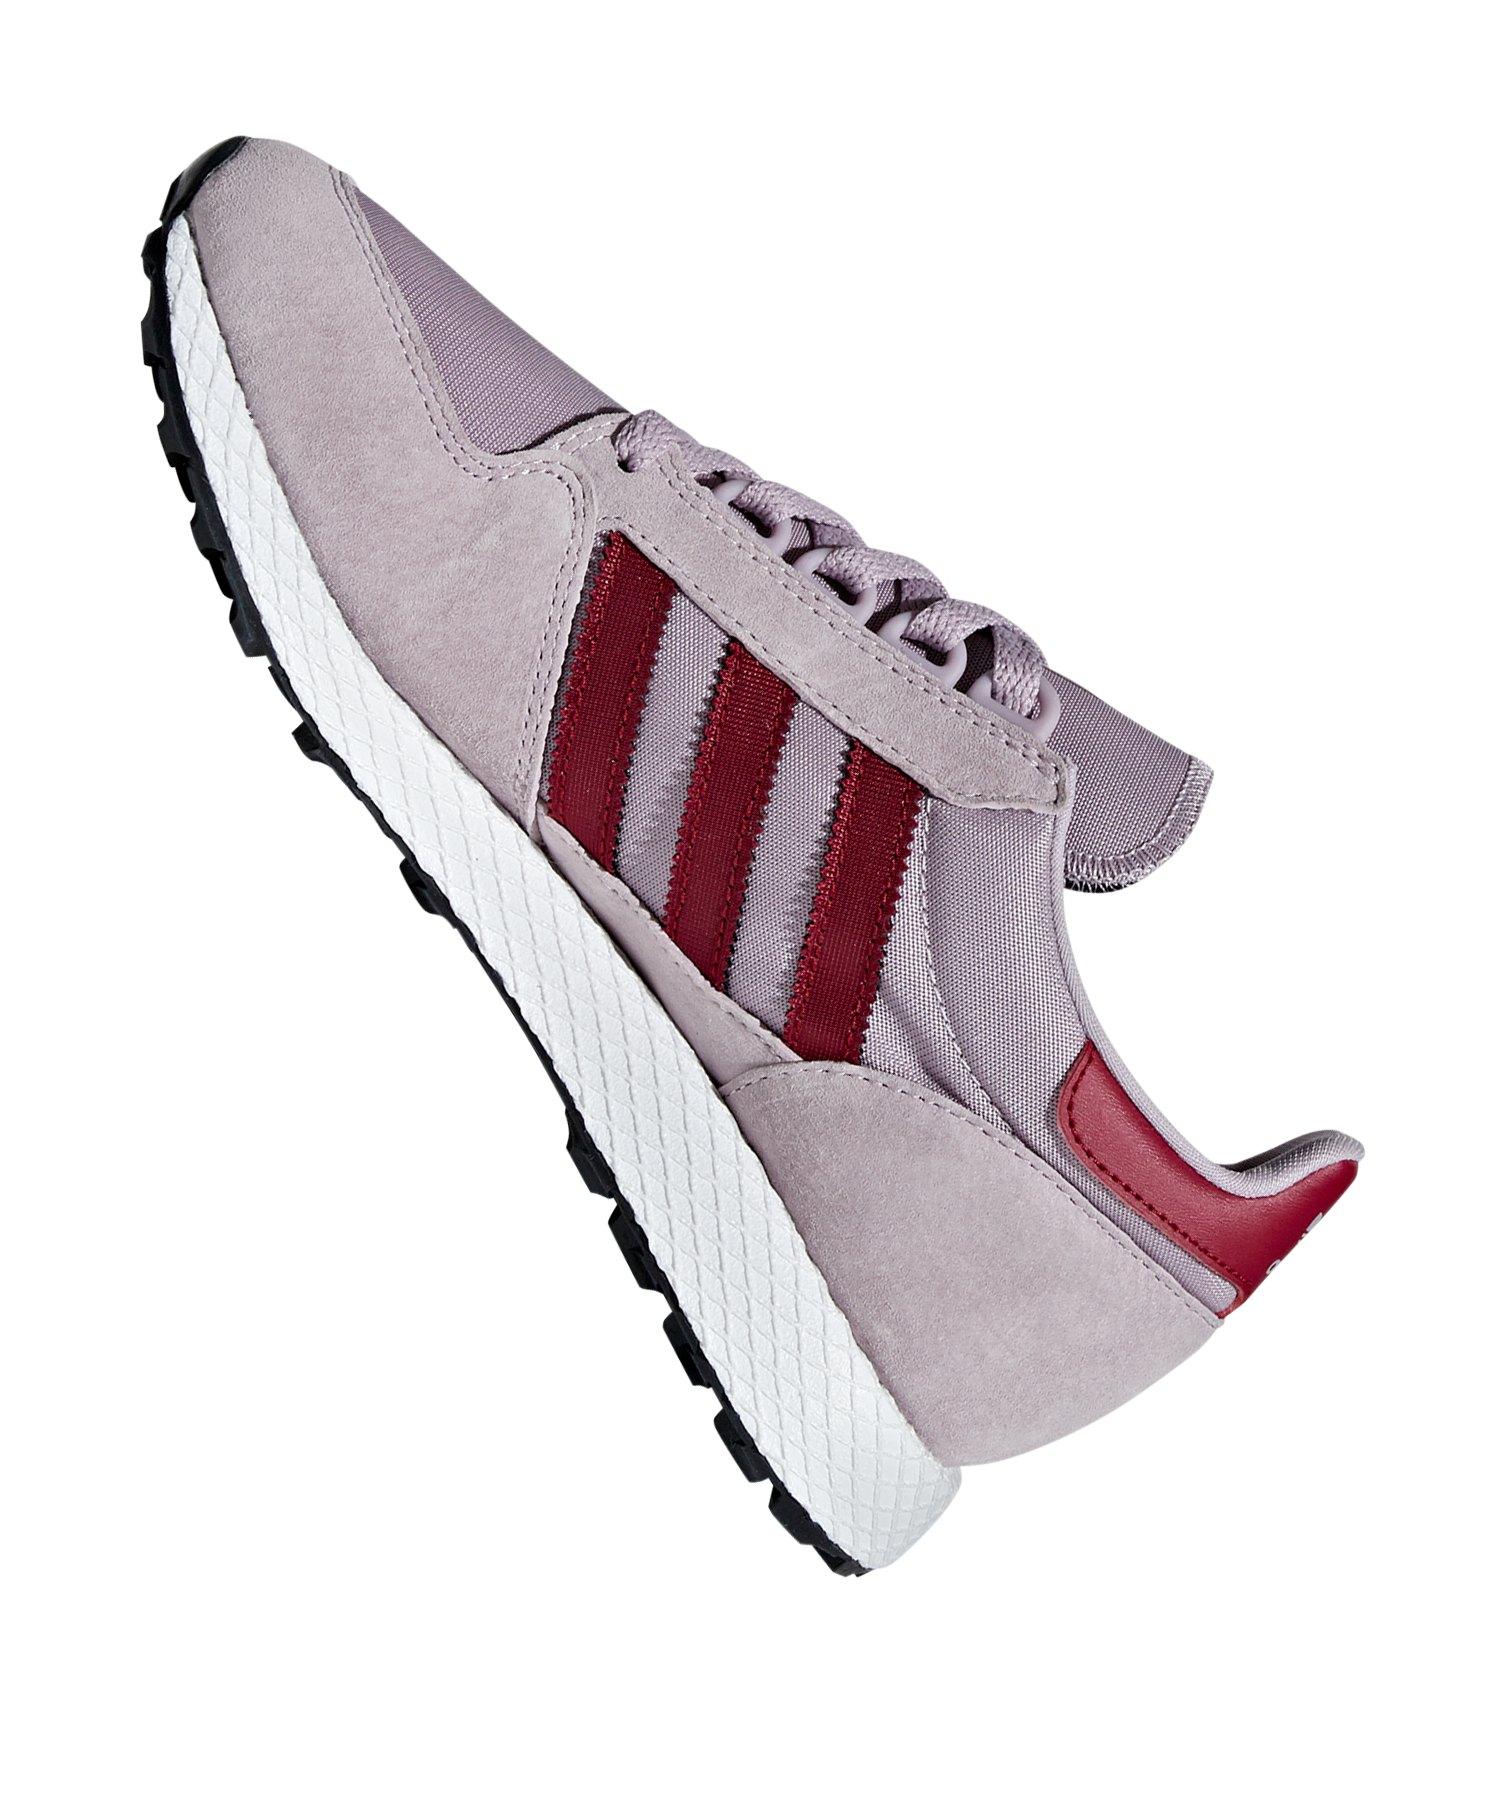 Forest Grove Damen Sneaker Lila Originals Adidas b7gyf6